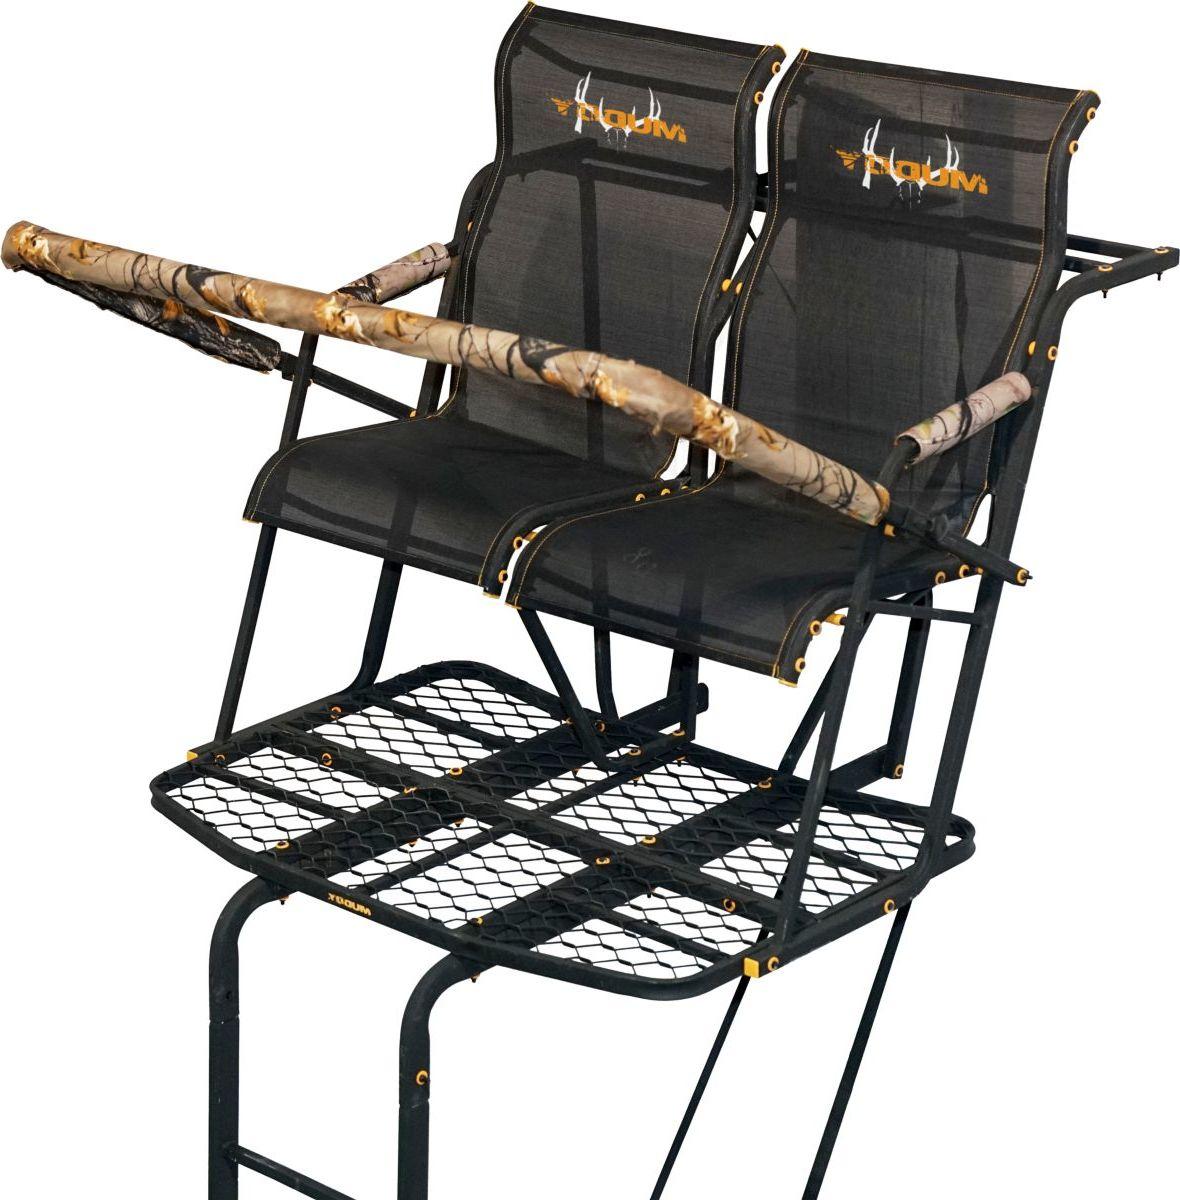 Muddy® The Rebel 2.5 Ladder Stand